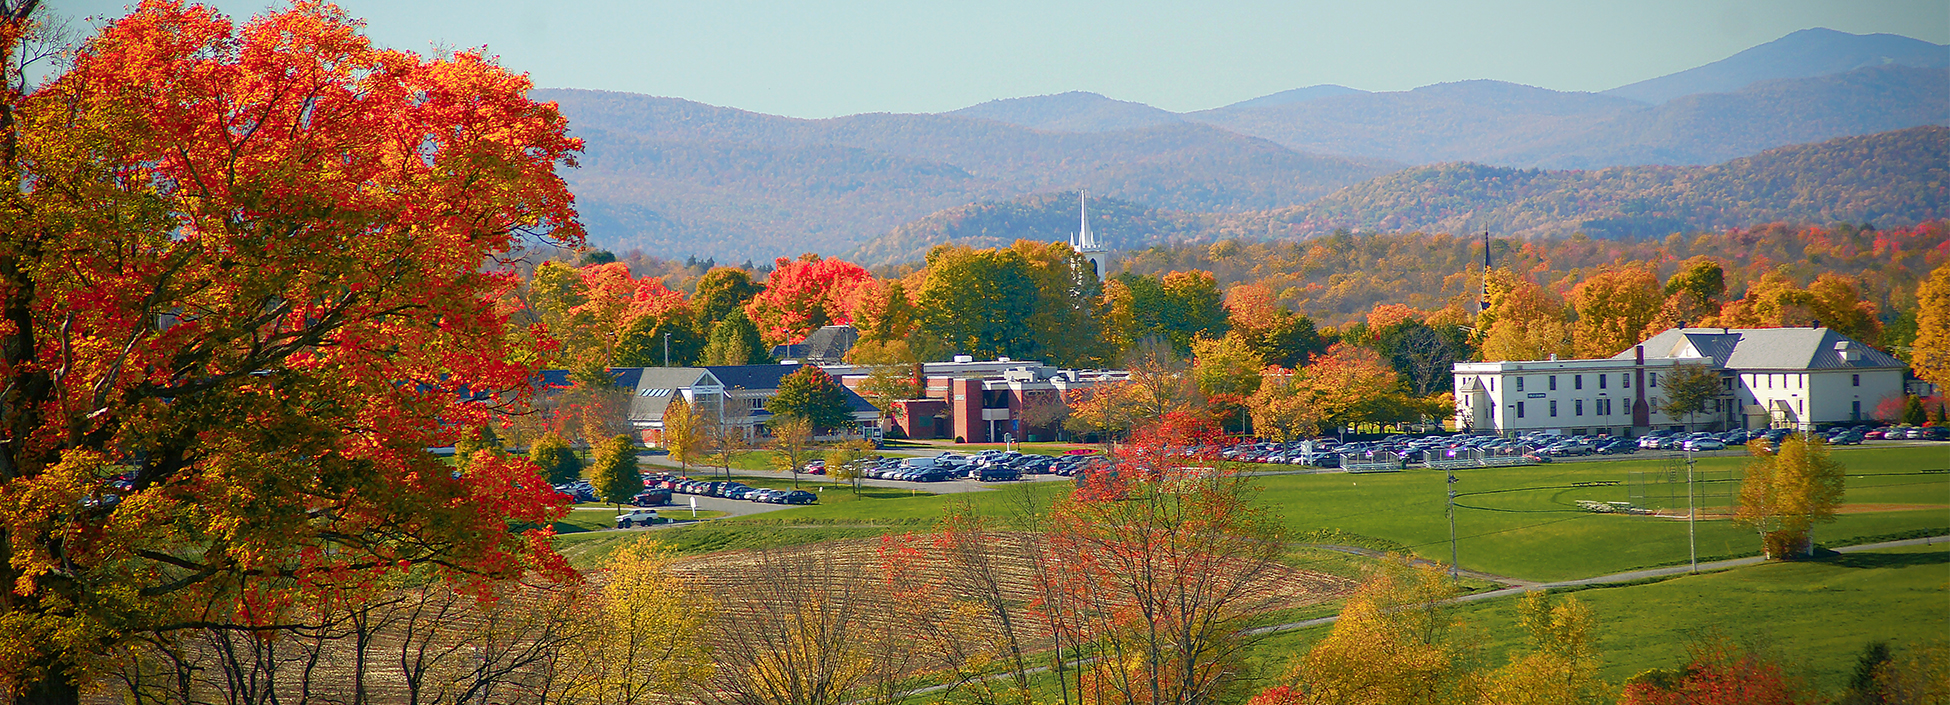 Randolph Center campus amidst beautiful fall foliage.